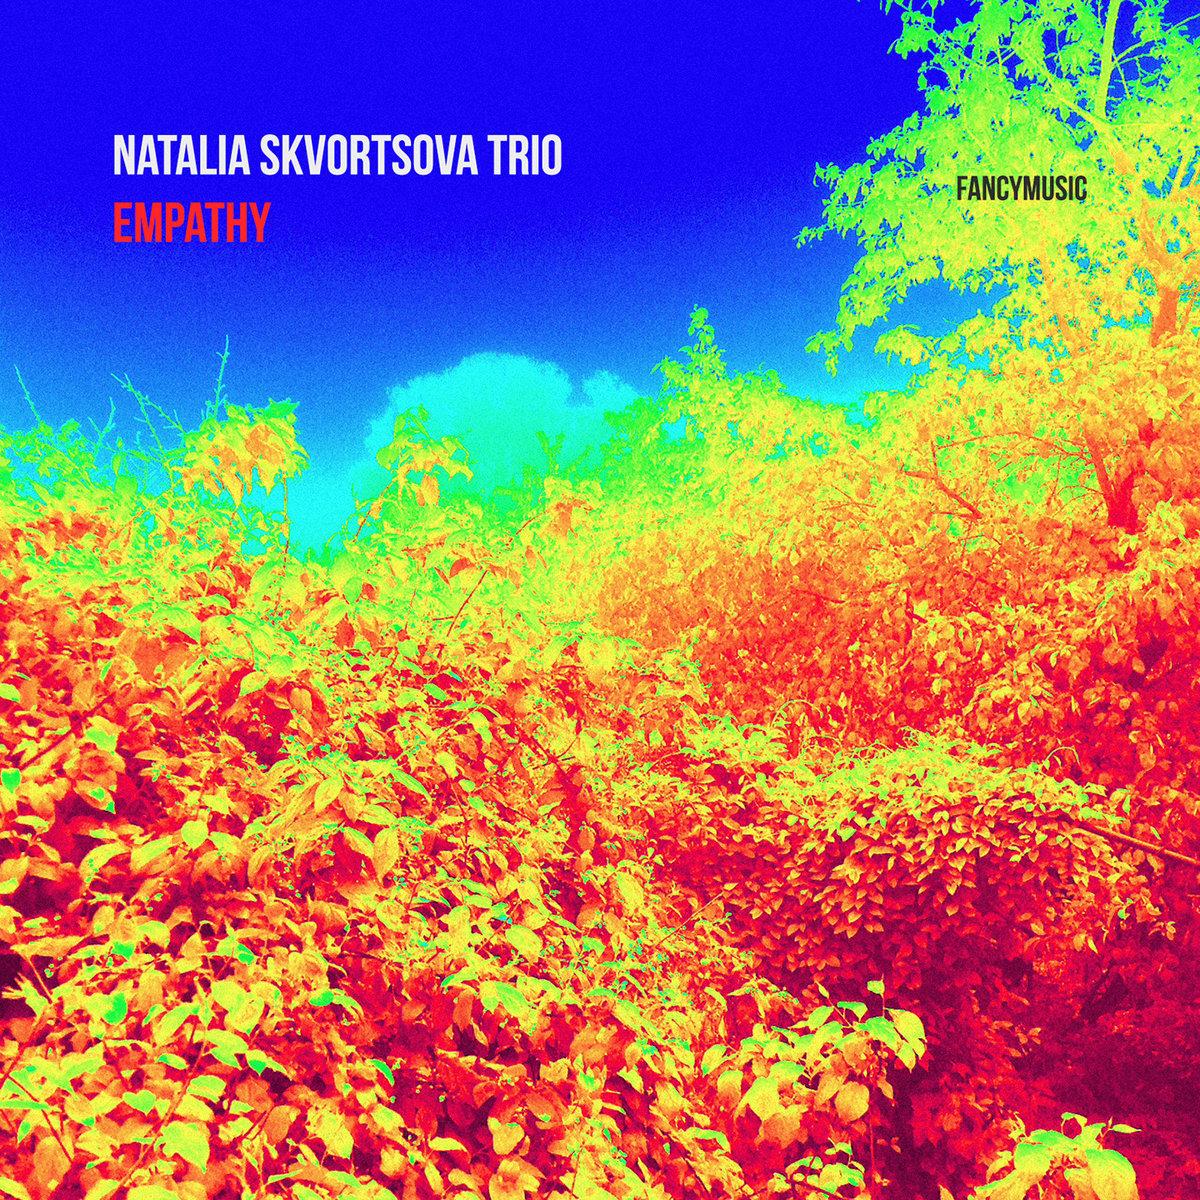 Empathy   Natalia Skvortsova Trio   FANCYMUSIC